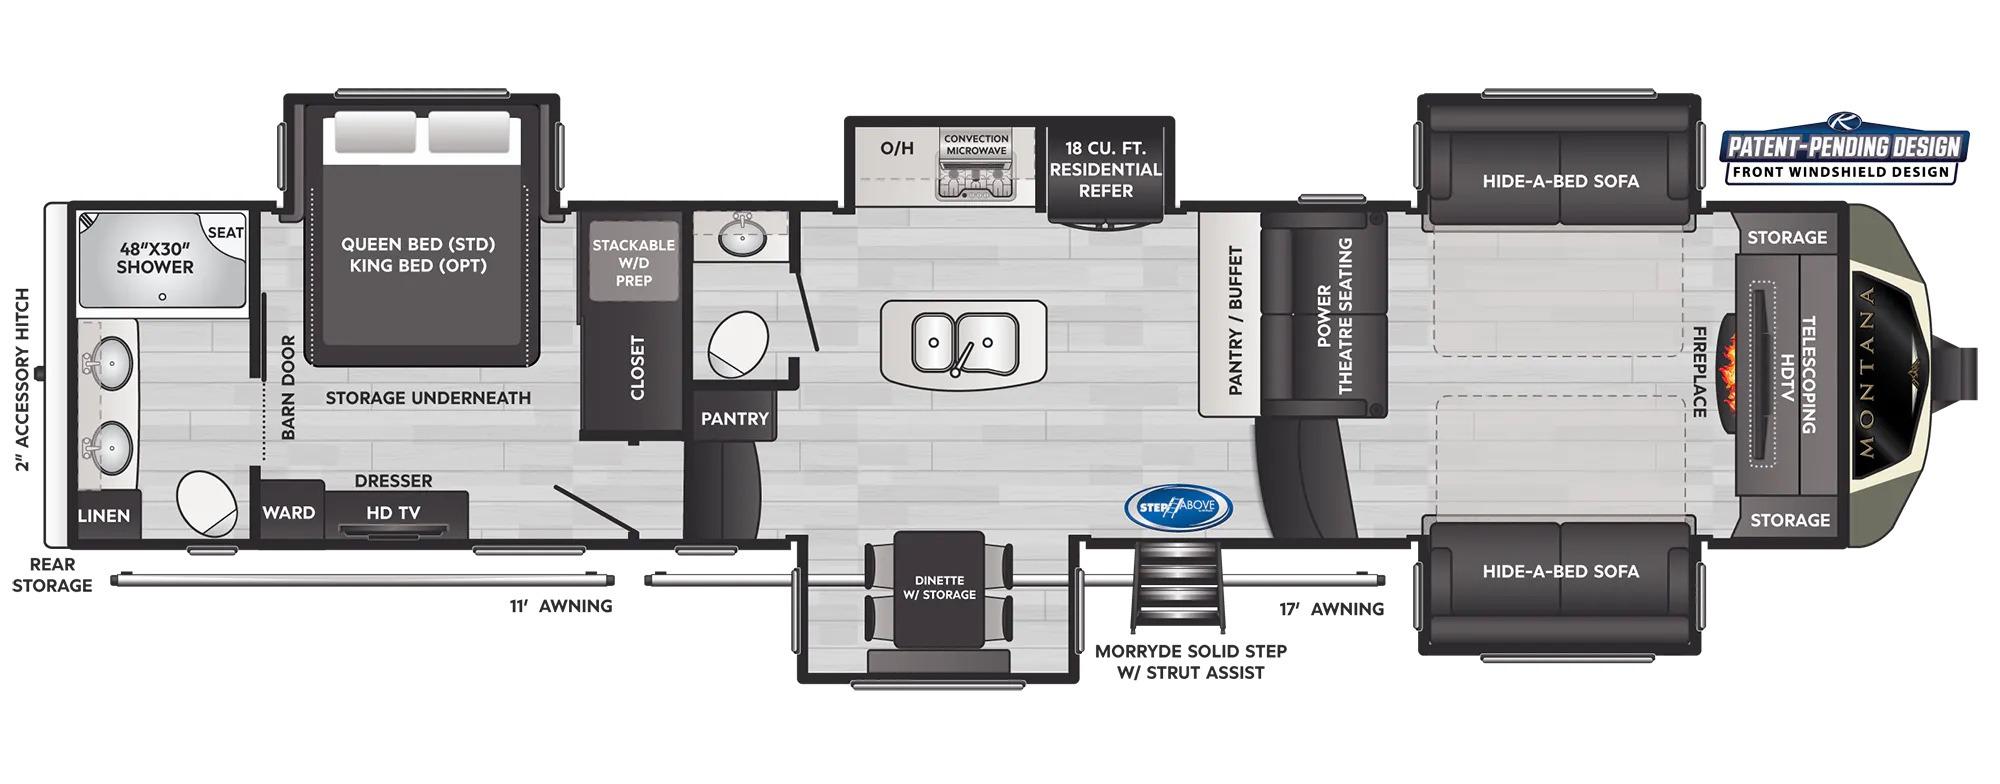 View Floor Plan for 2022 KEYSTONE MONTANA 3761FL